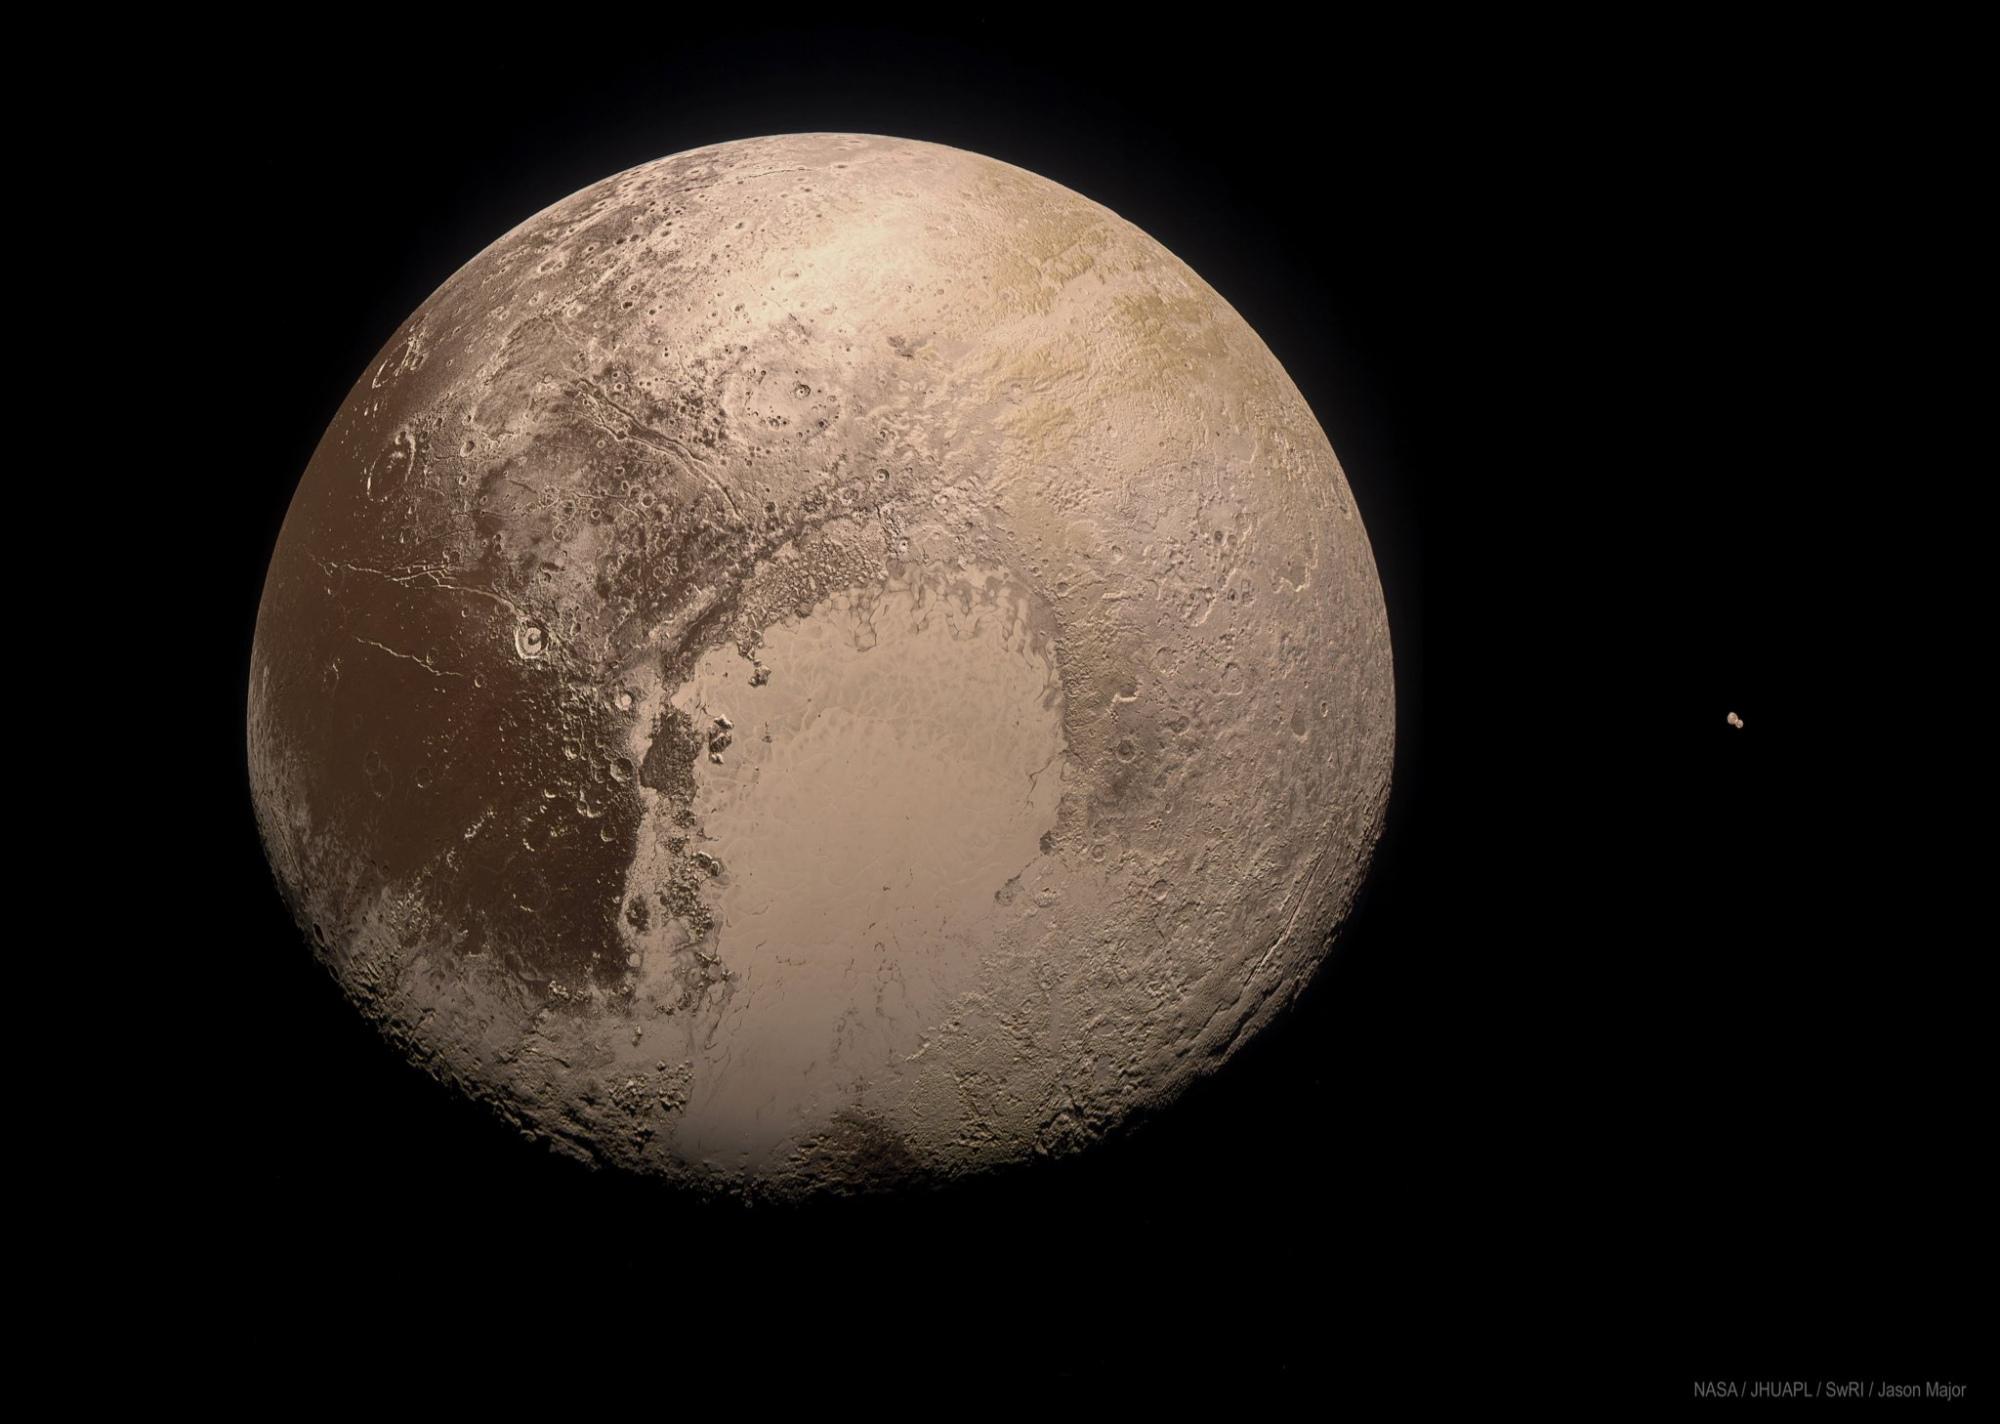 Pluton-Arrokoh.jpg